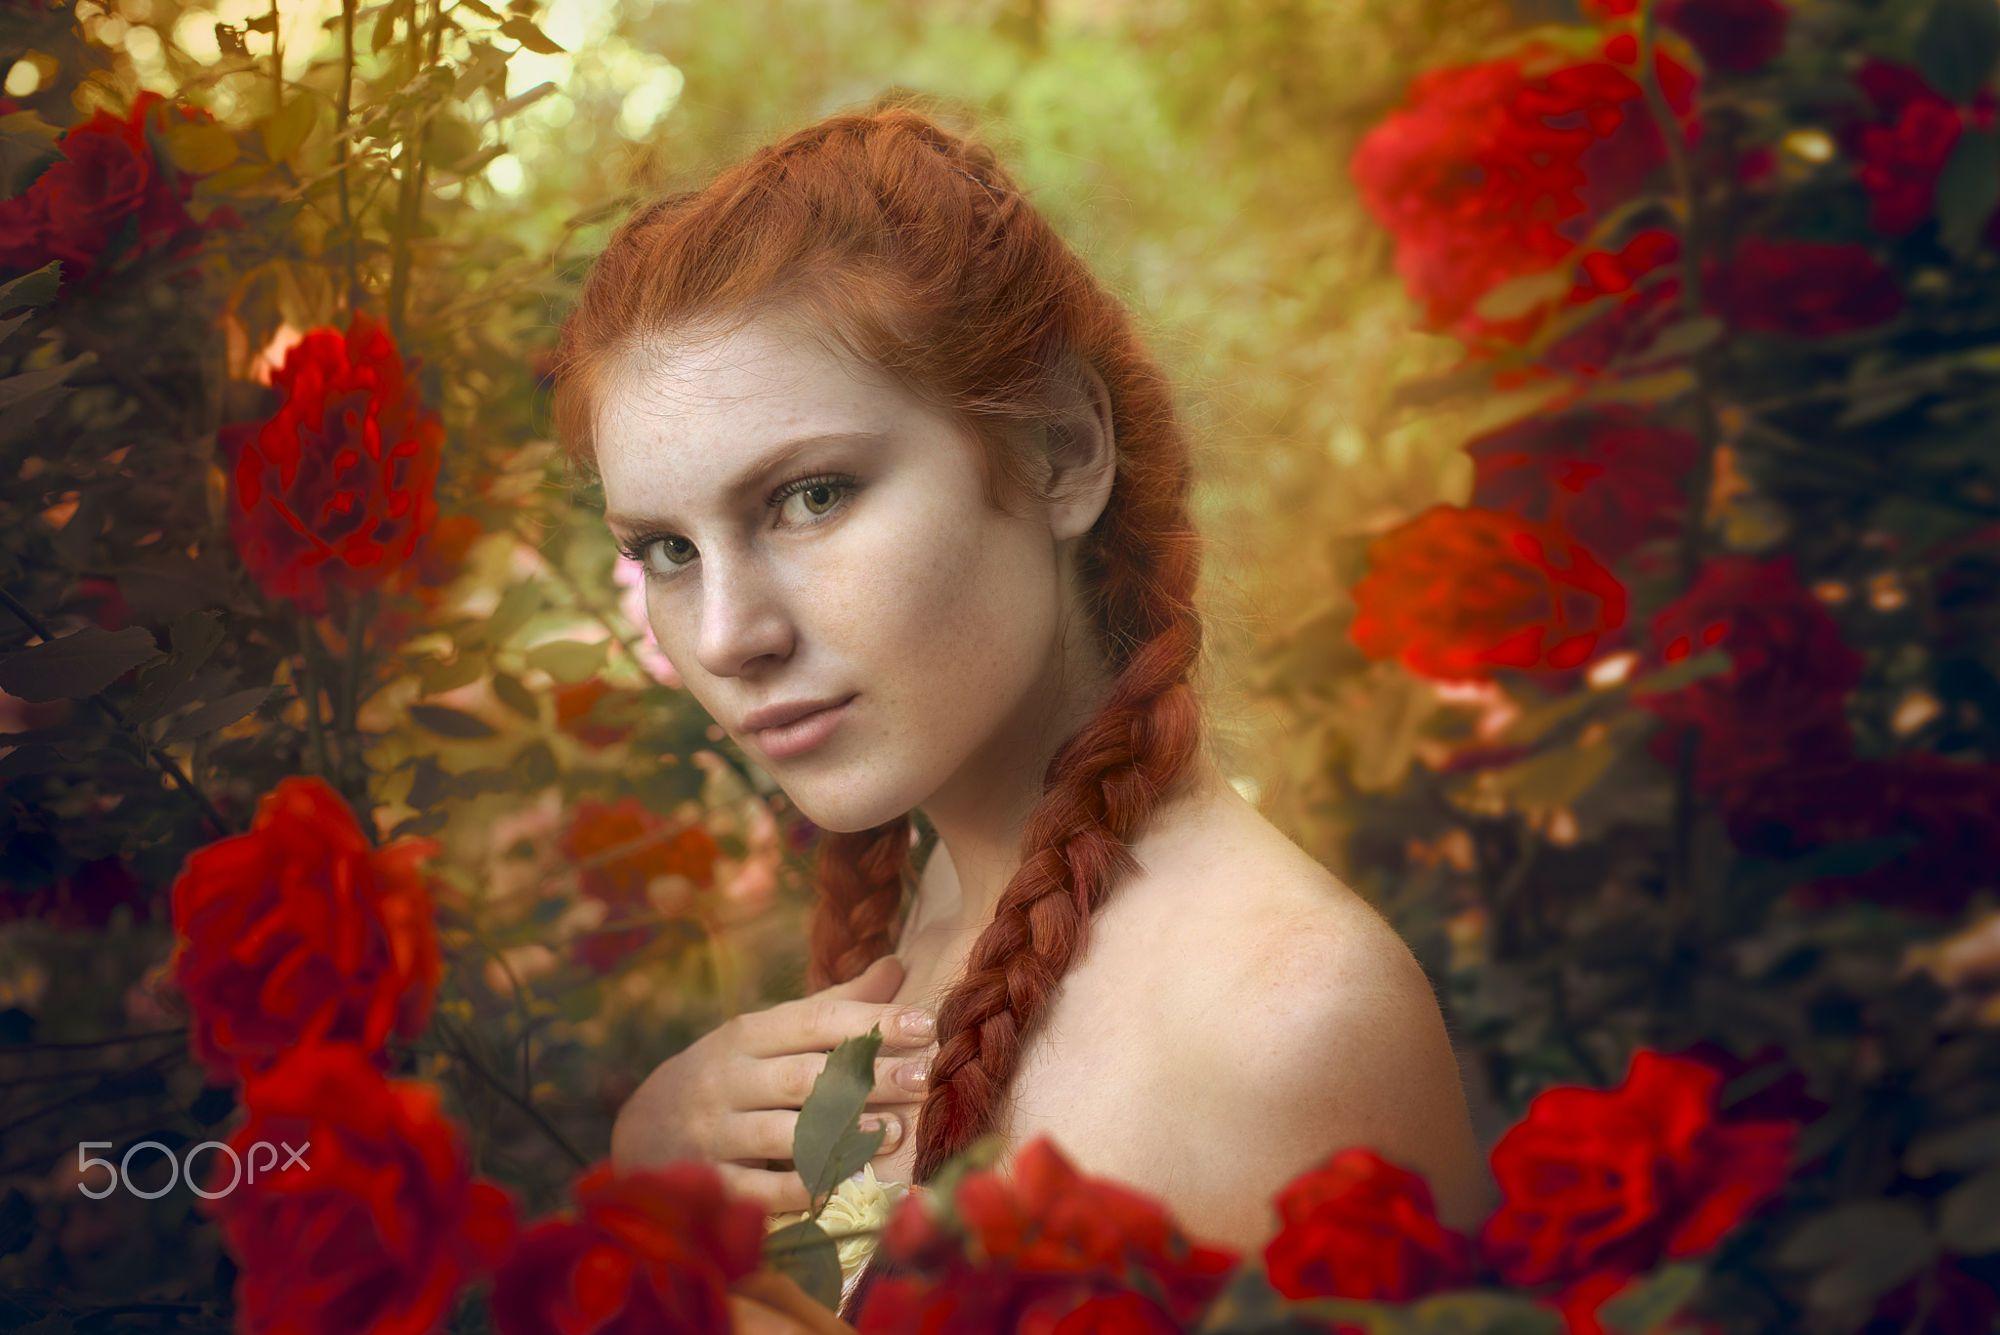 red by Tanya Markova - Nya - Photo 159173875 - 500px